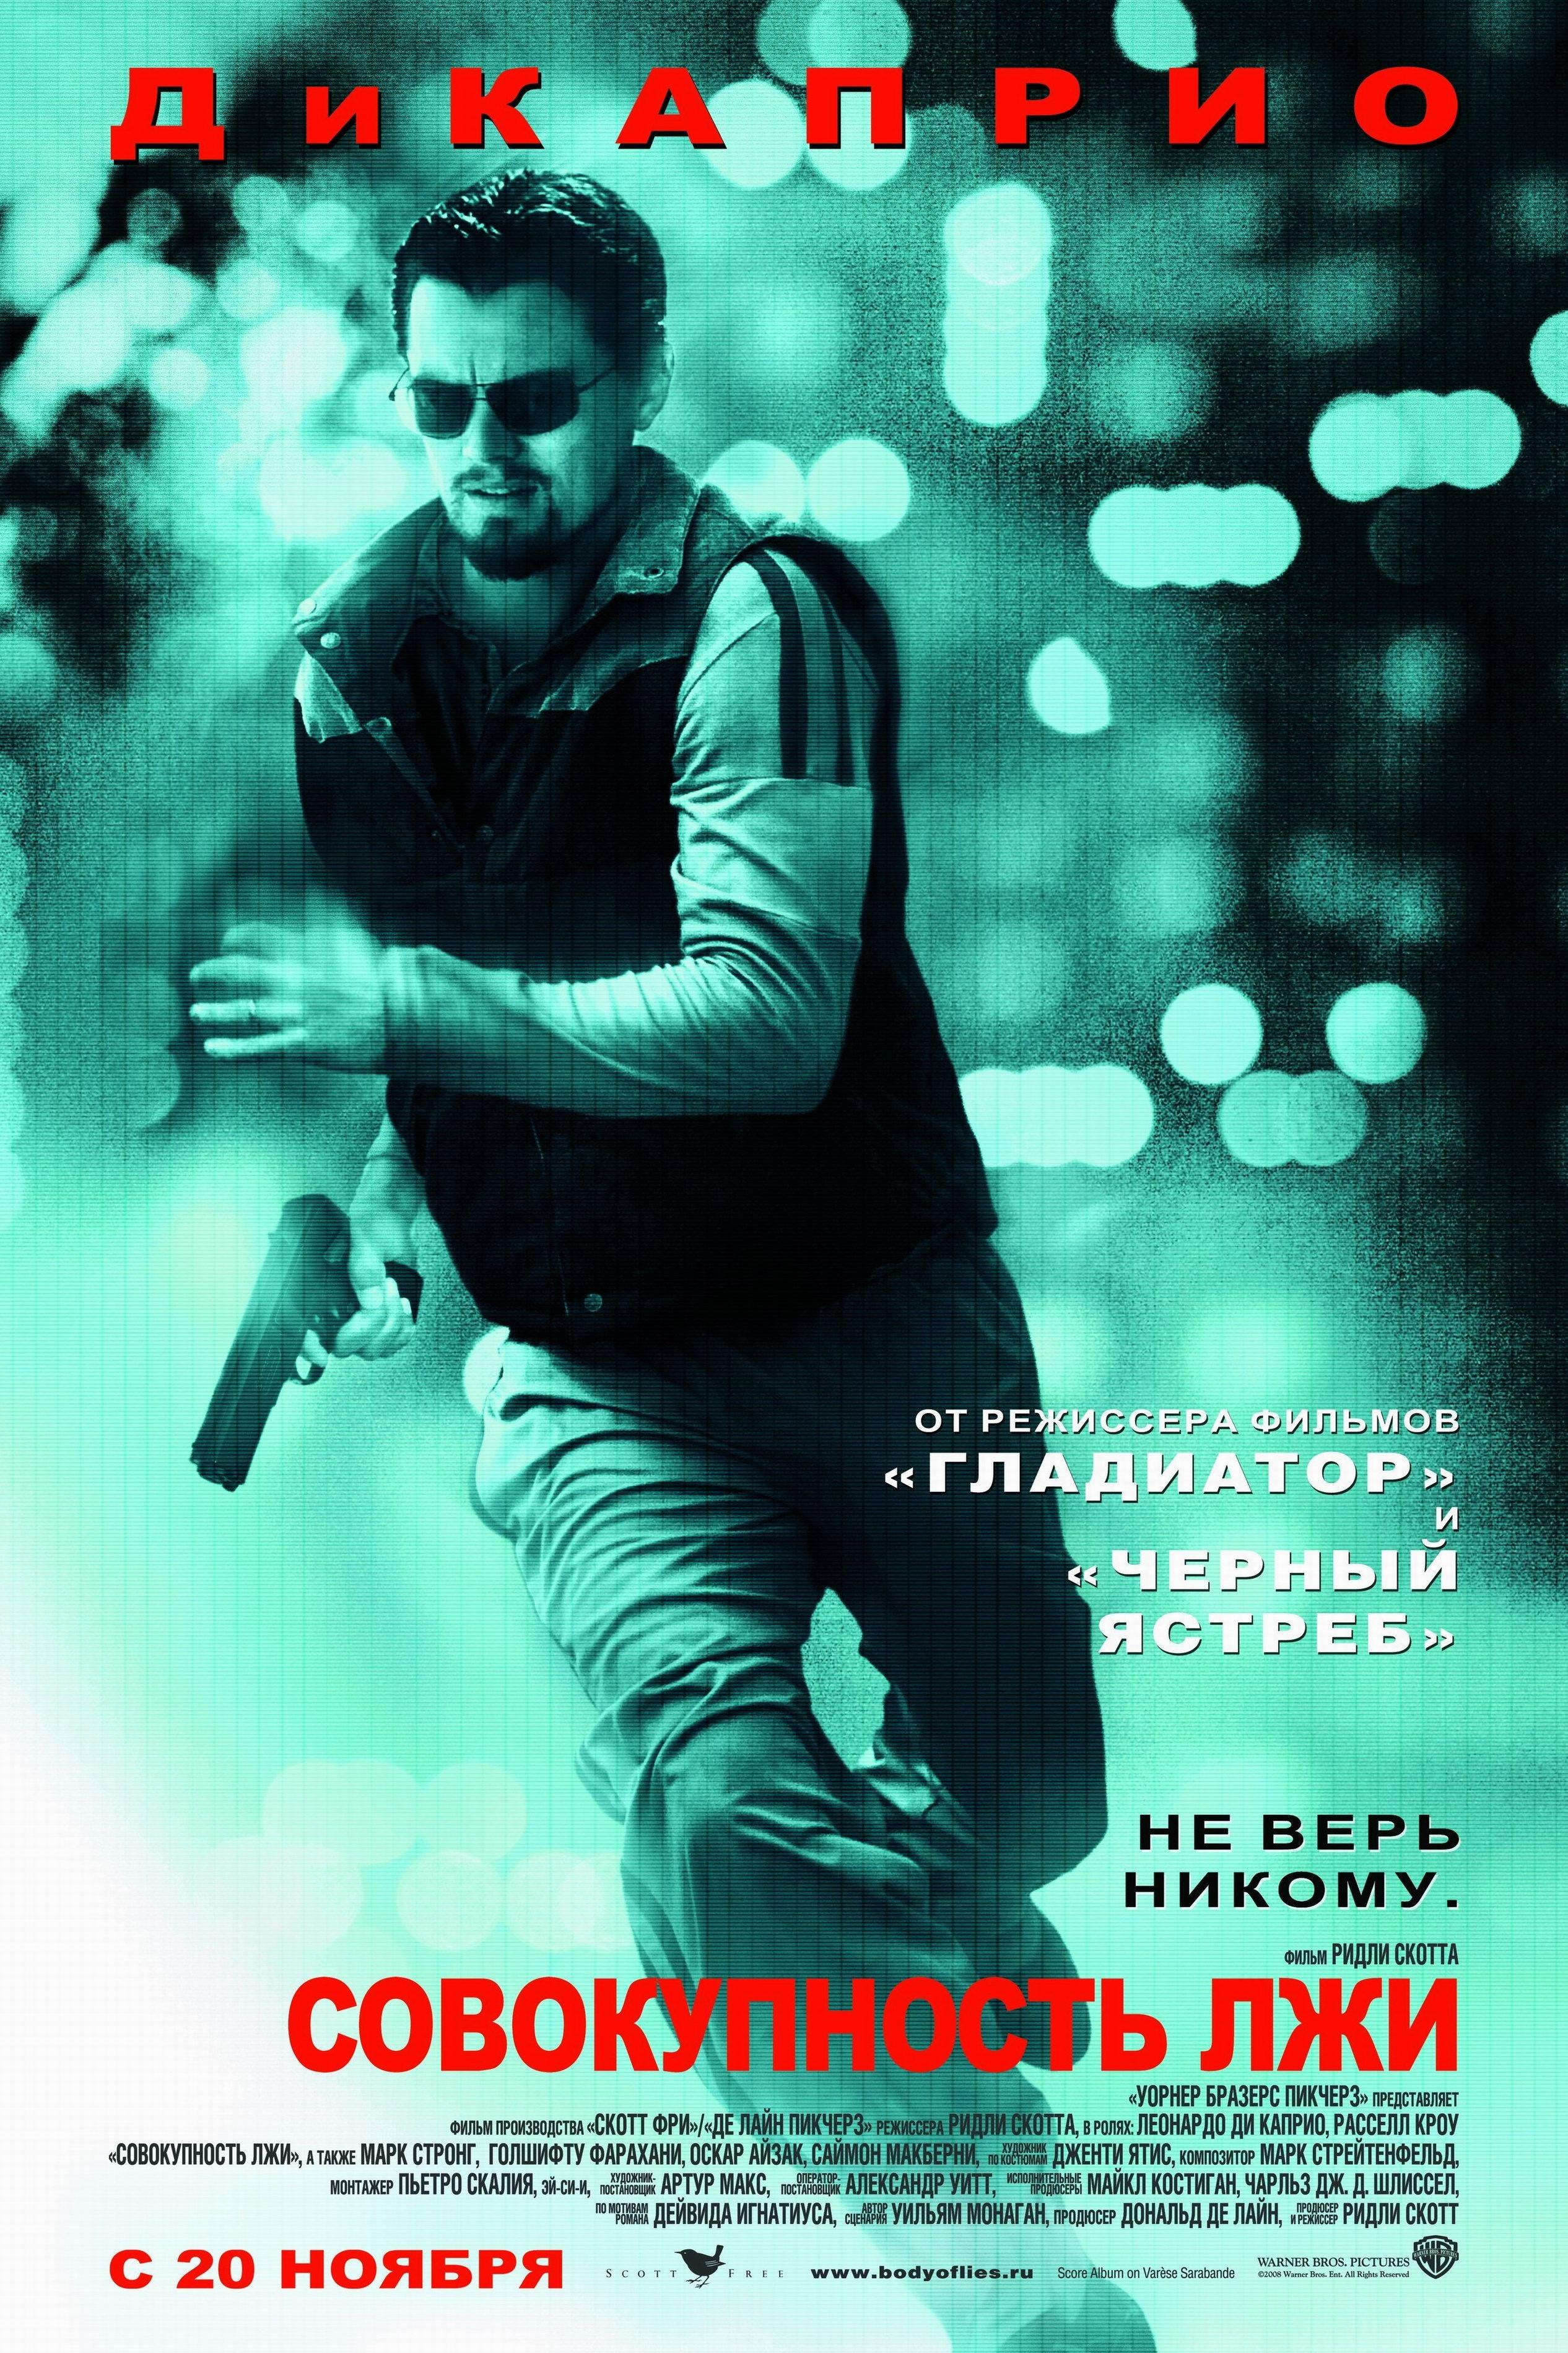 Body of Lies (2008) poster - FreeMoviePosters.net